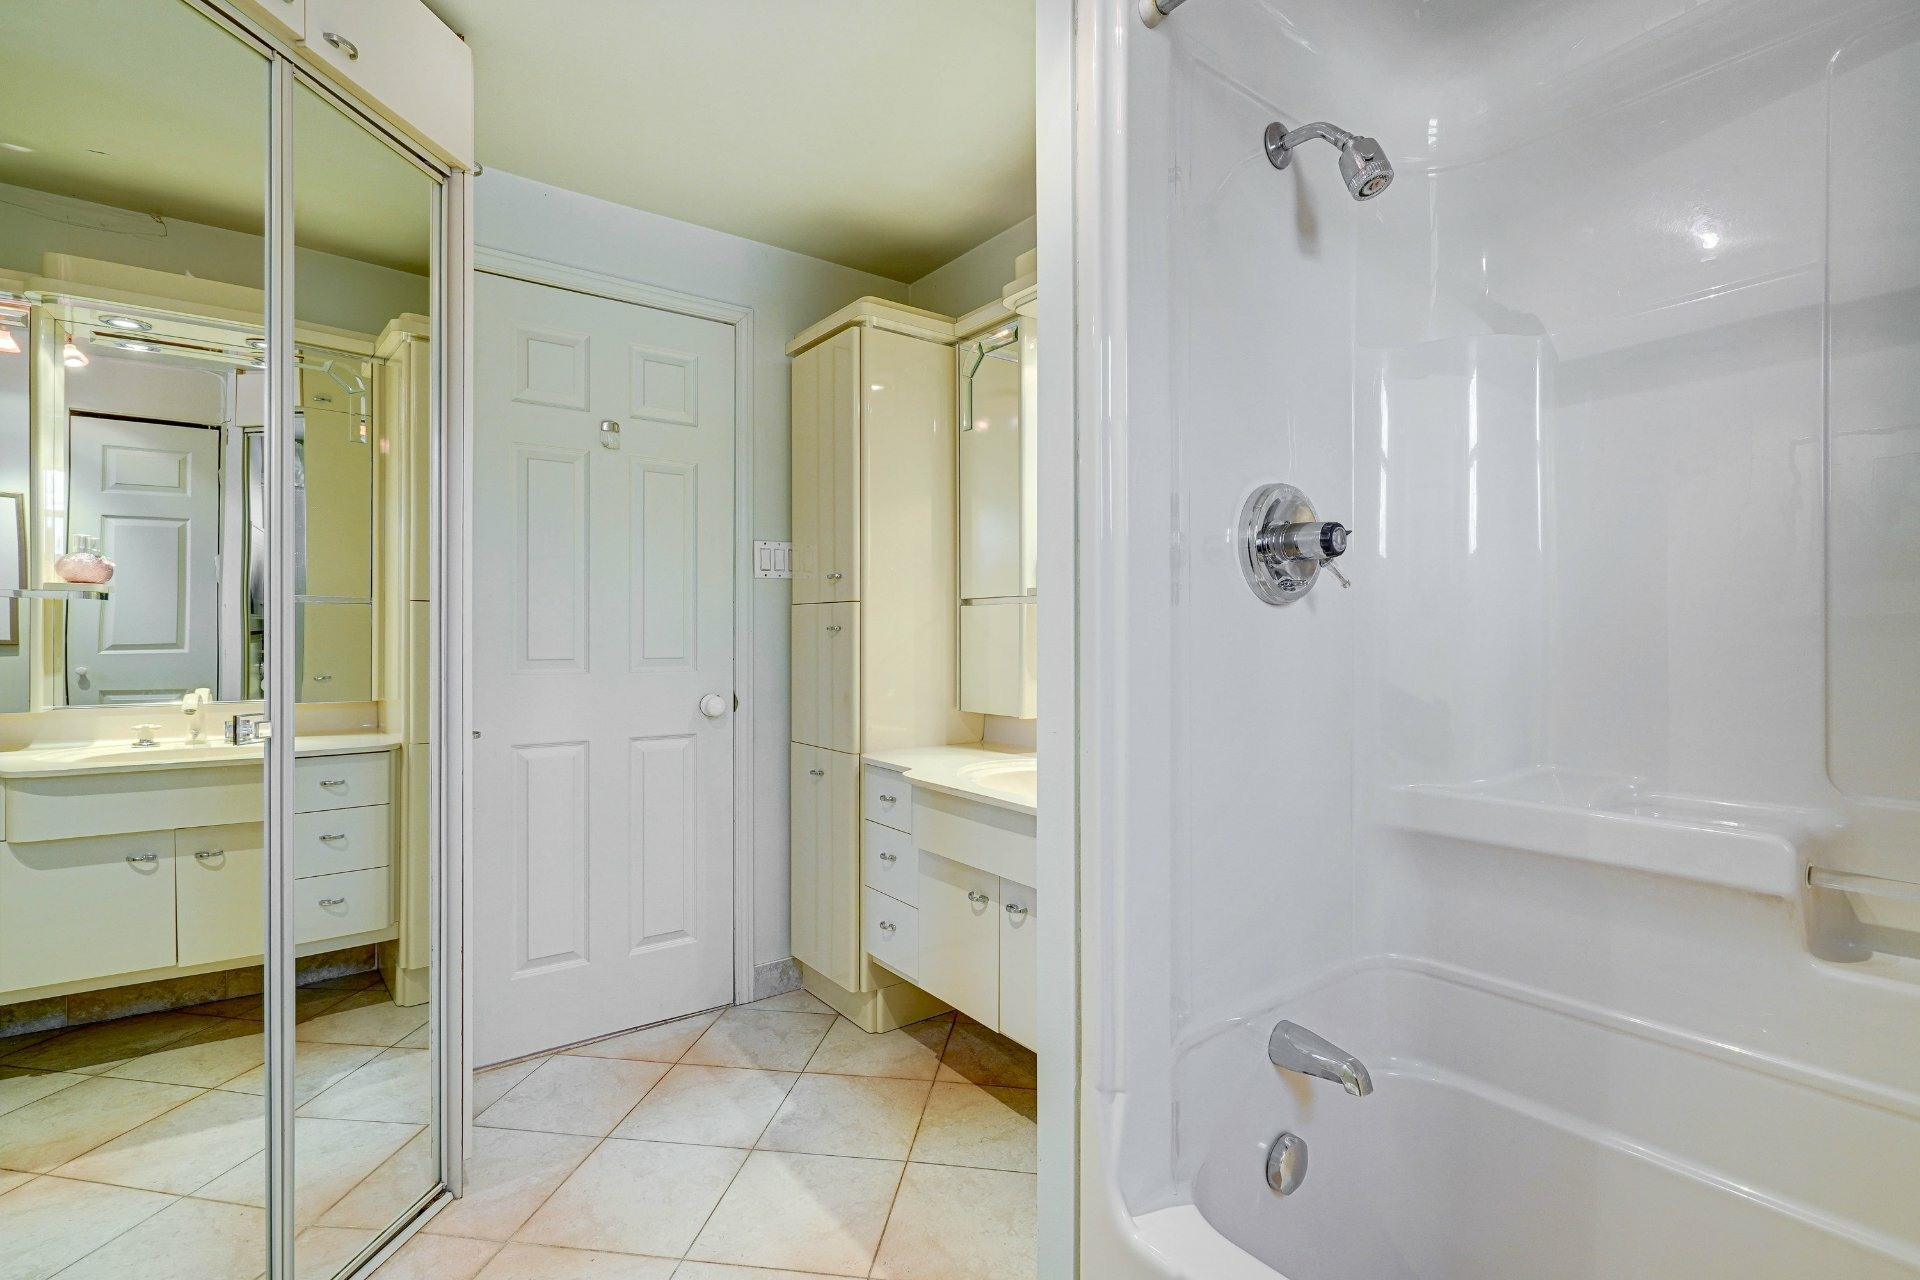 image 16 - Triplex For sale Dorval - 4 rooms